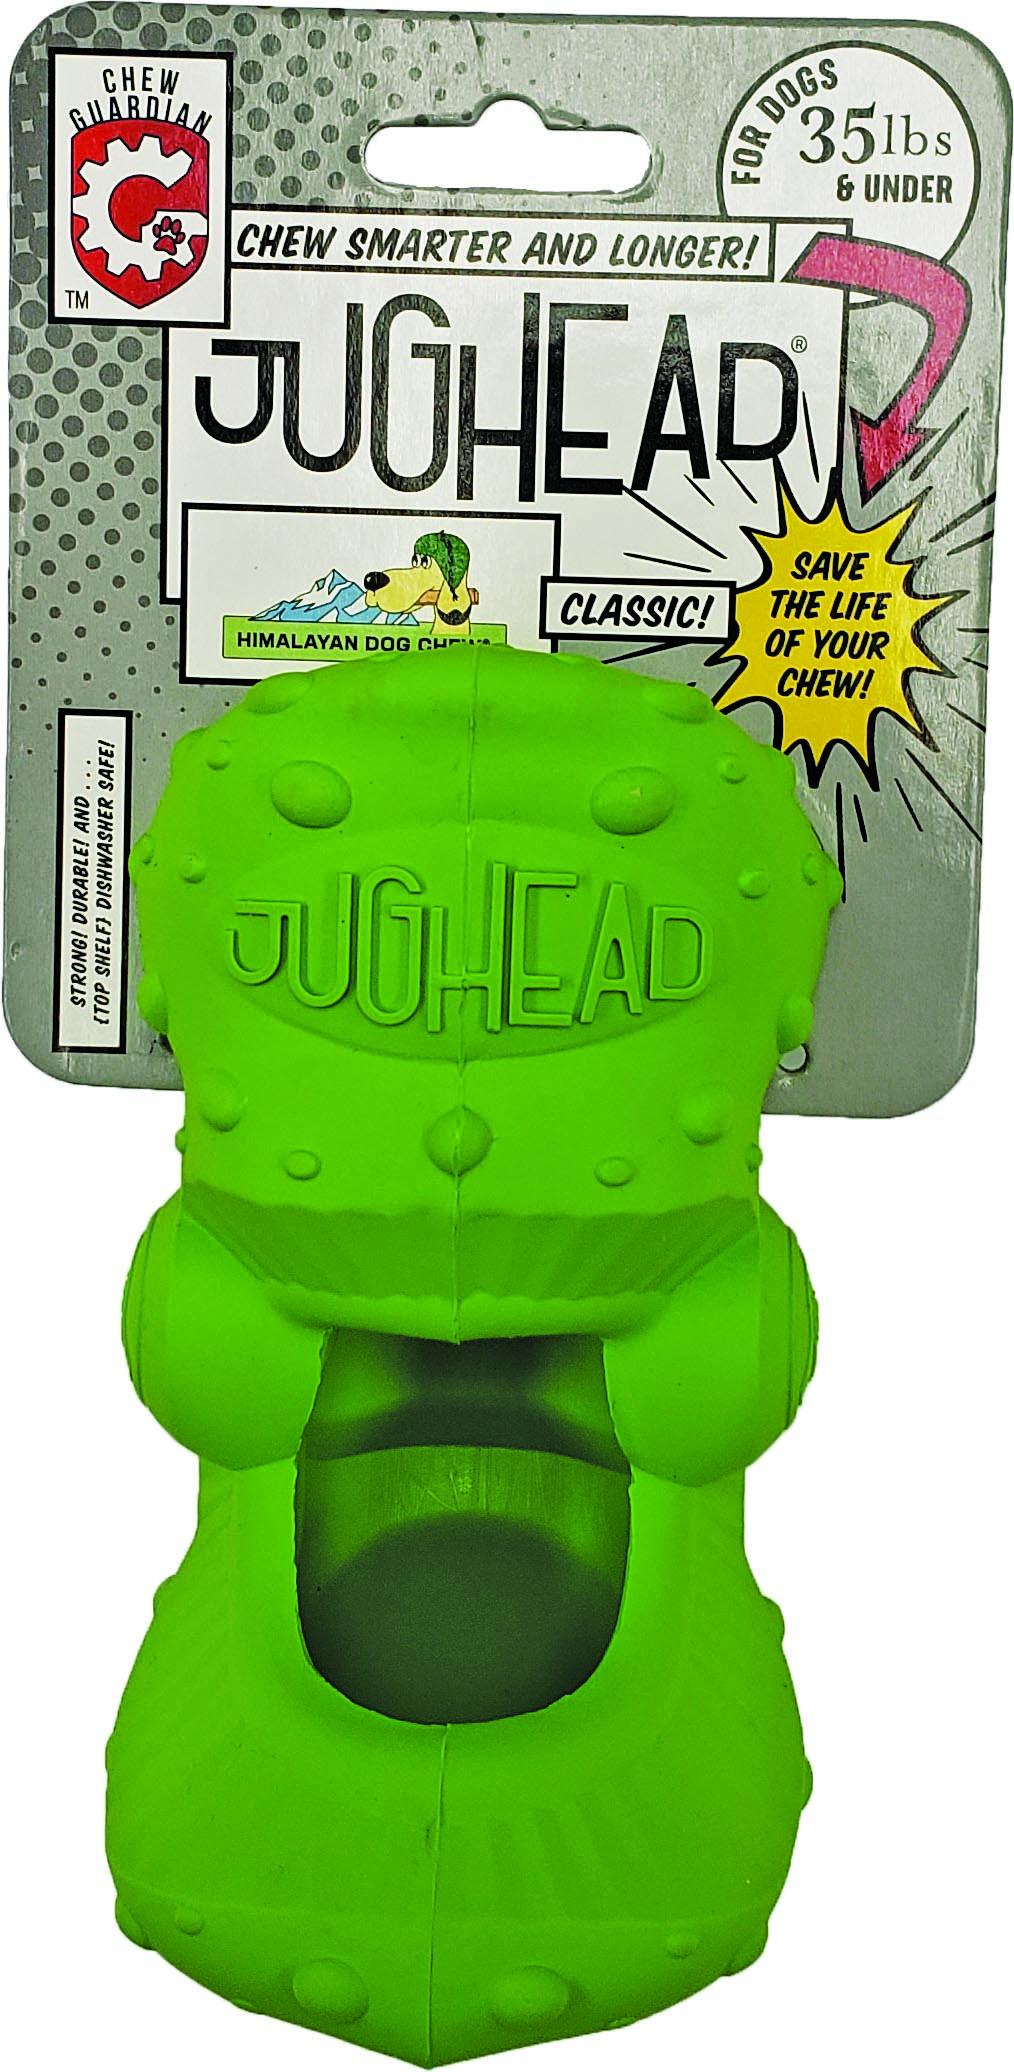 Himalayan Dog Chew Jughead Dog Toy, Classic